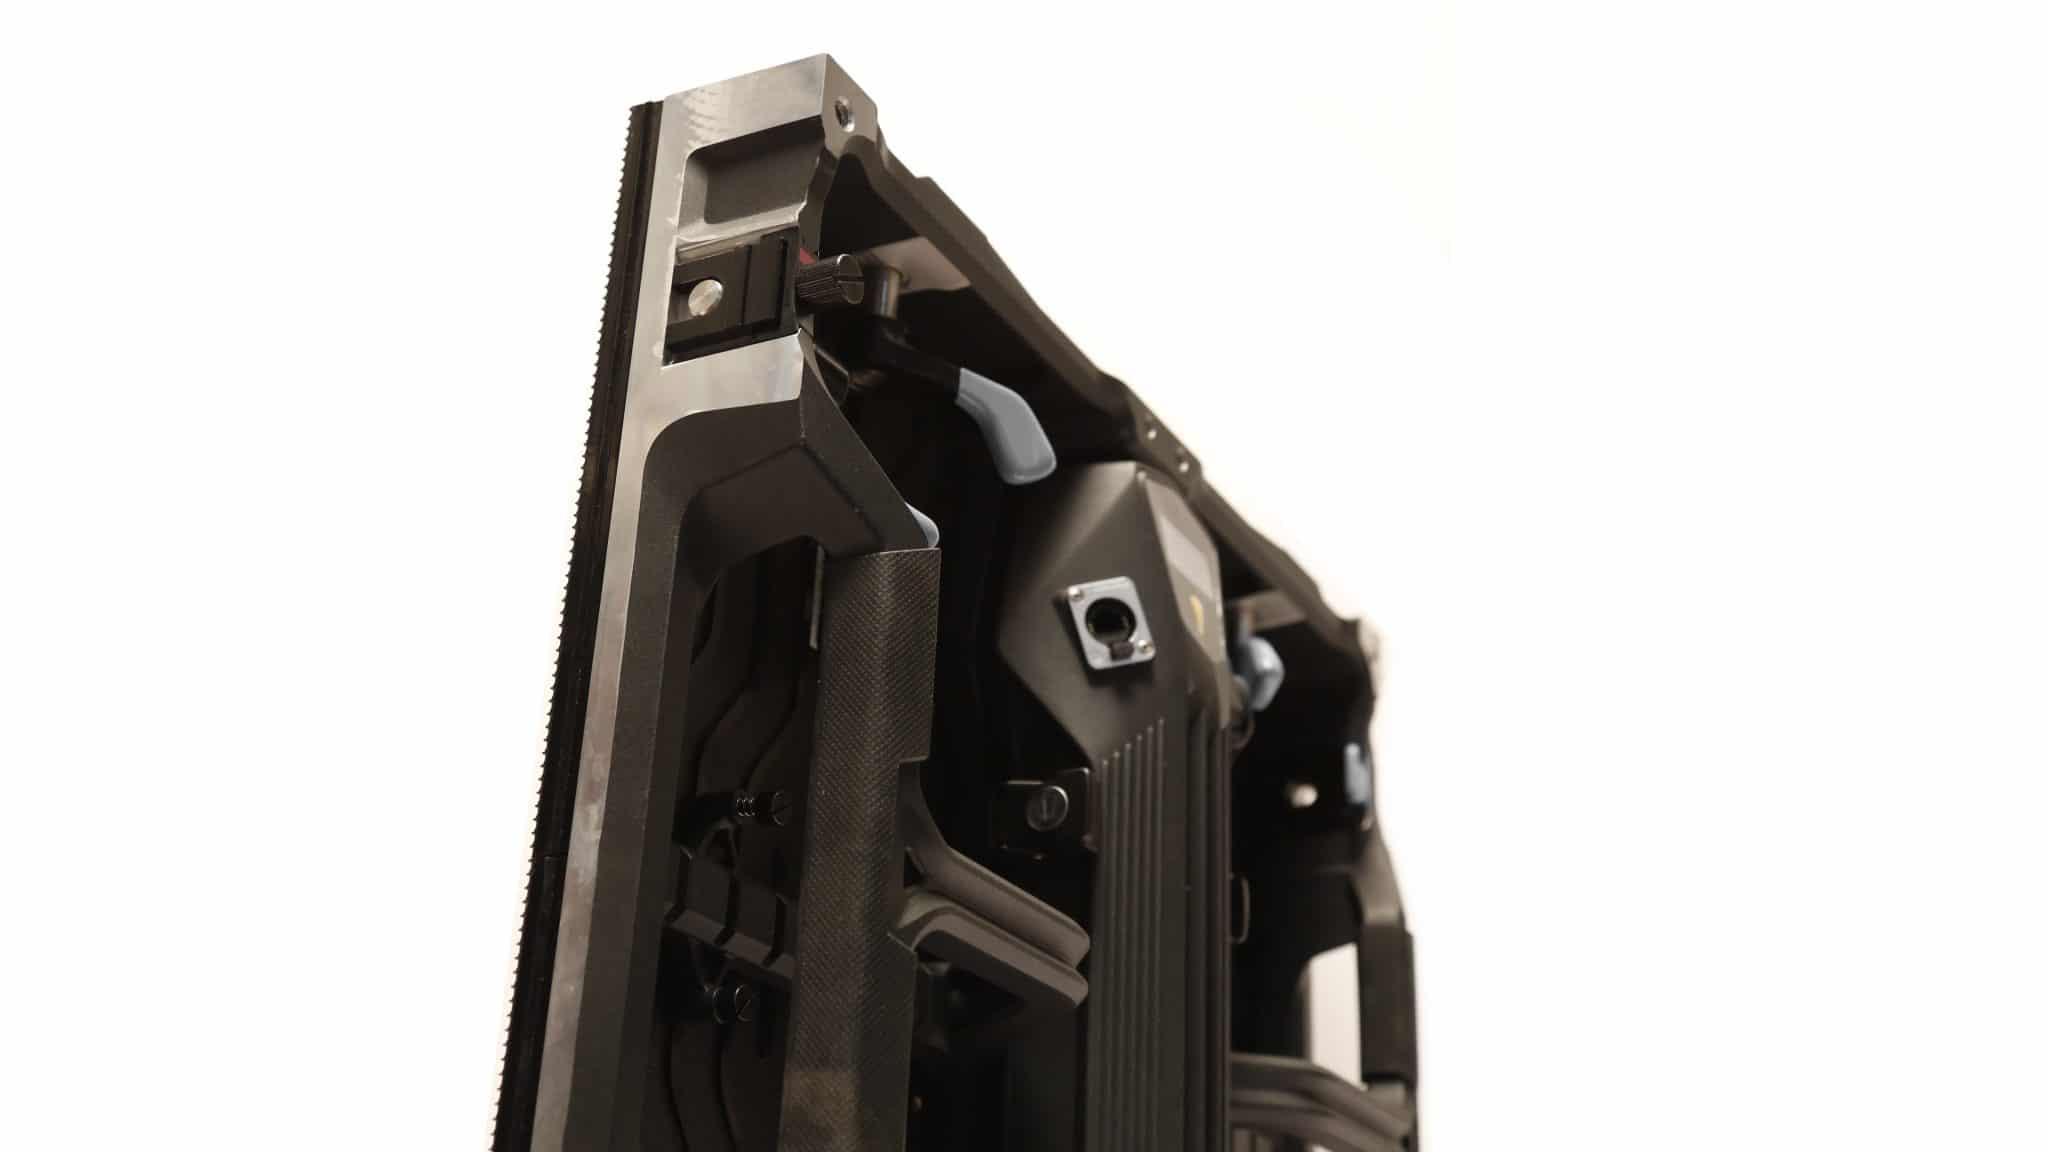 LEDitgo rX3io Side-Top